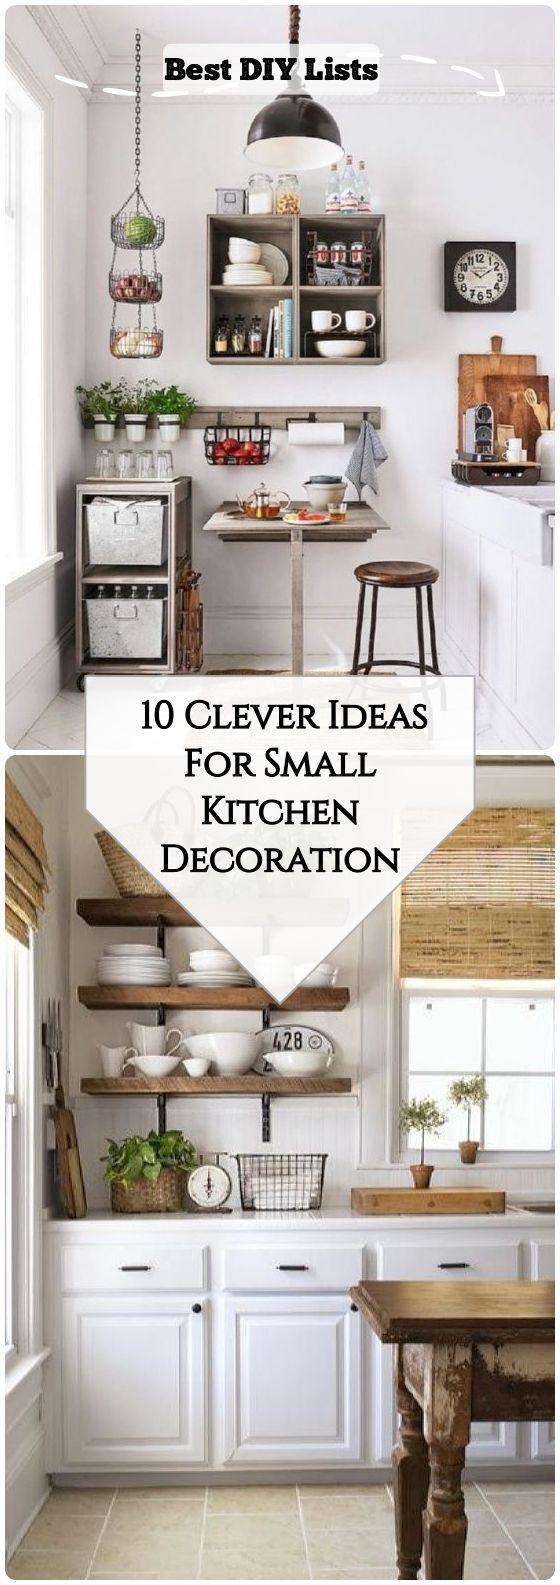 Photo of Home Interior Art New Small Kitchen Decoration #kitchendecoration